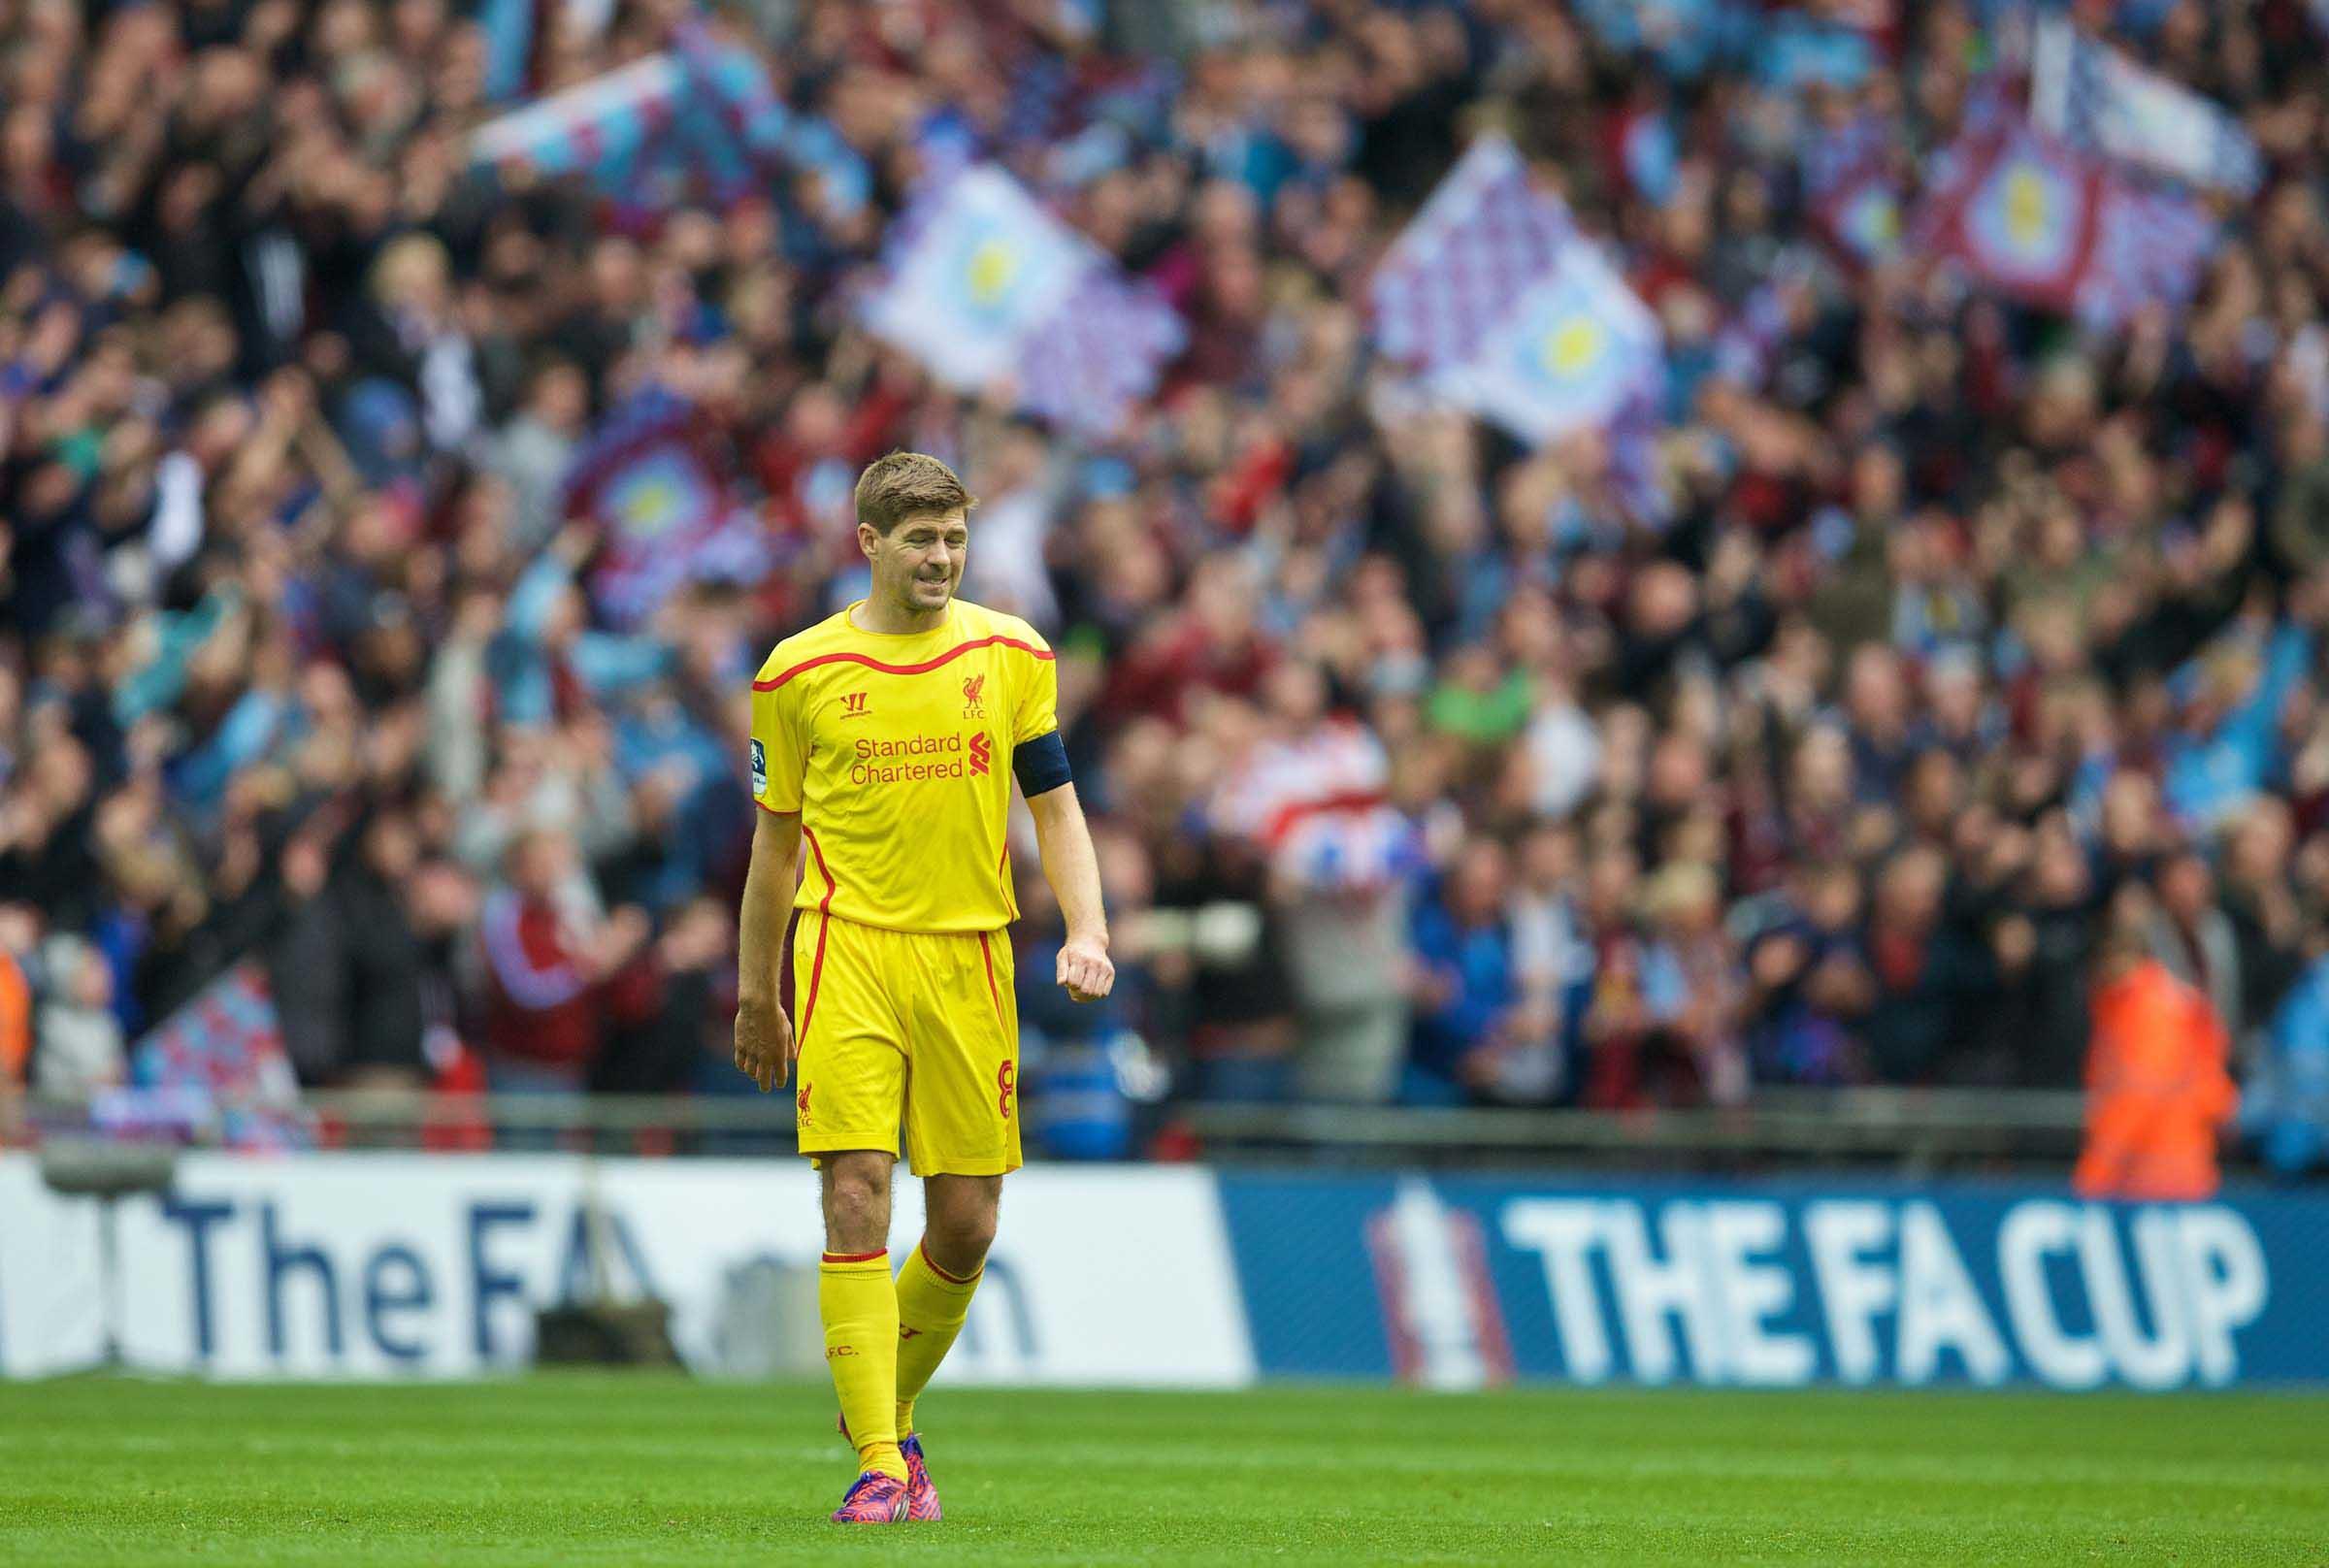 Football - FA Cup - Semi-Final - Aston Villa FC v Liverpool FC